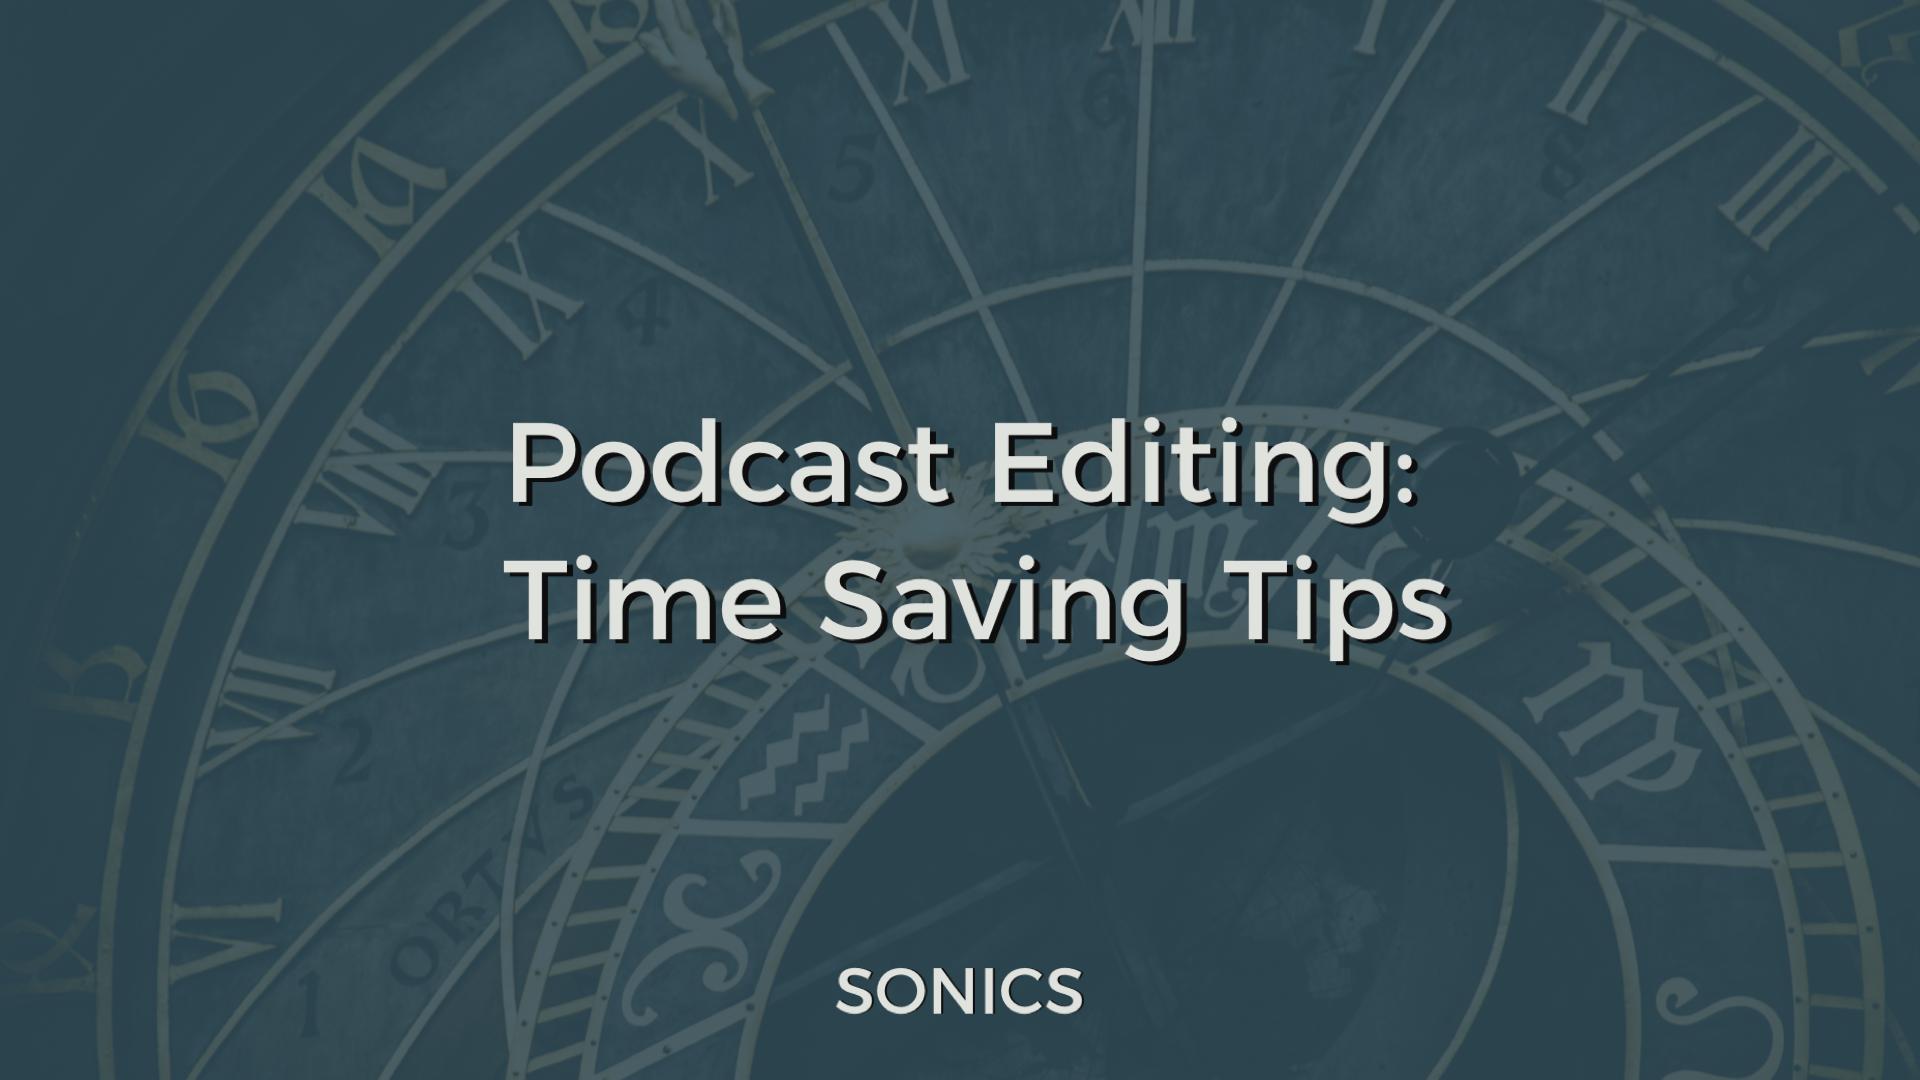 Podcast Editing: Time Saving Tips